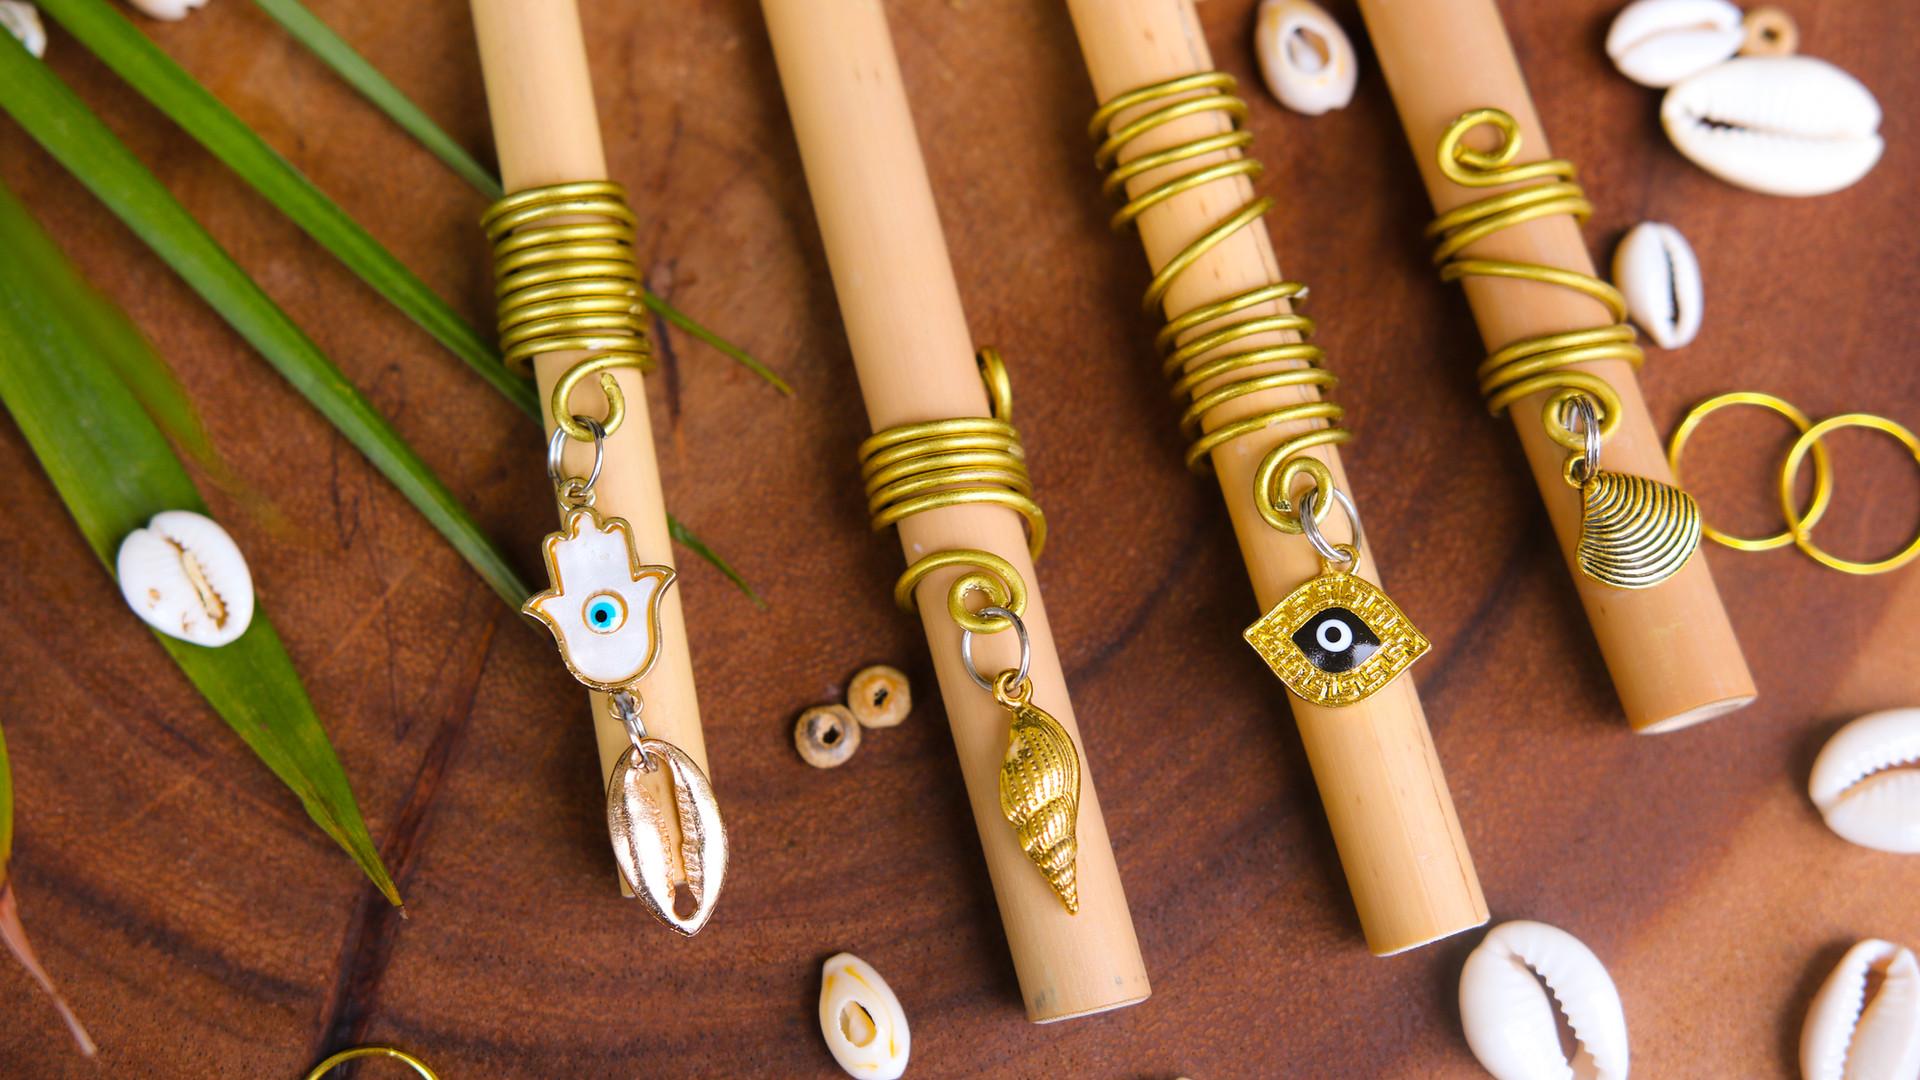 Mali Pah Wire Loc Accessories